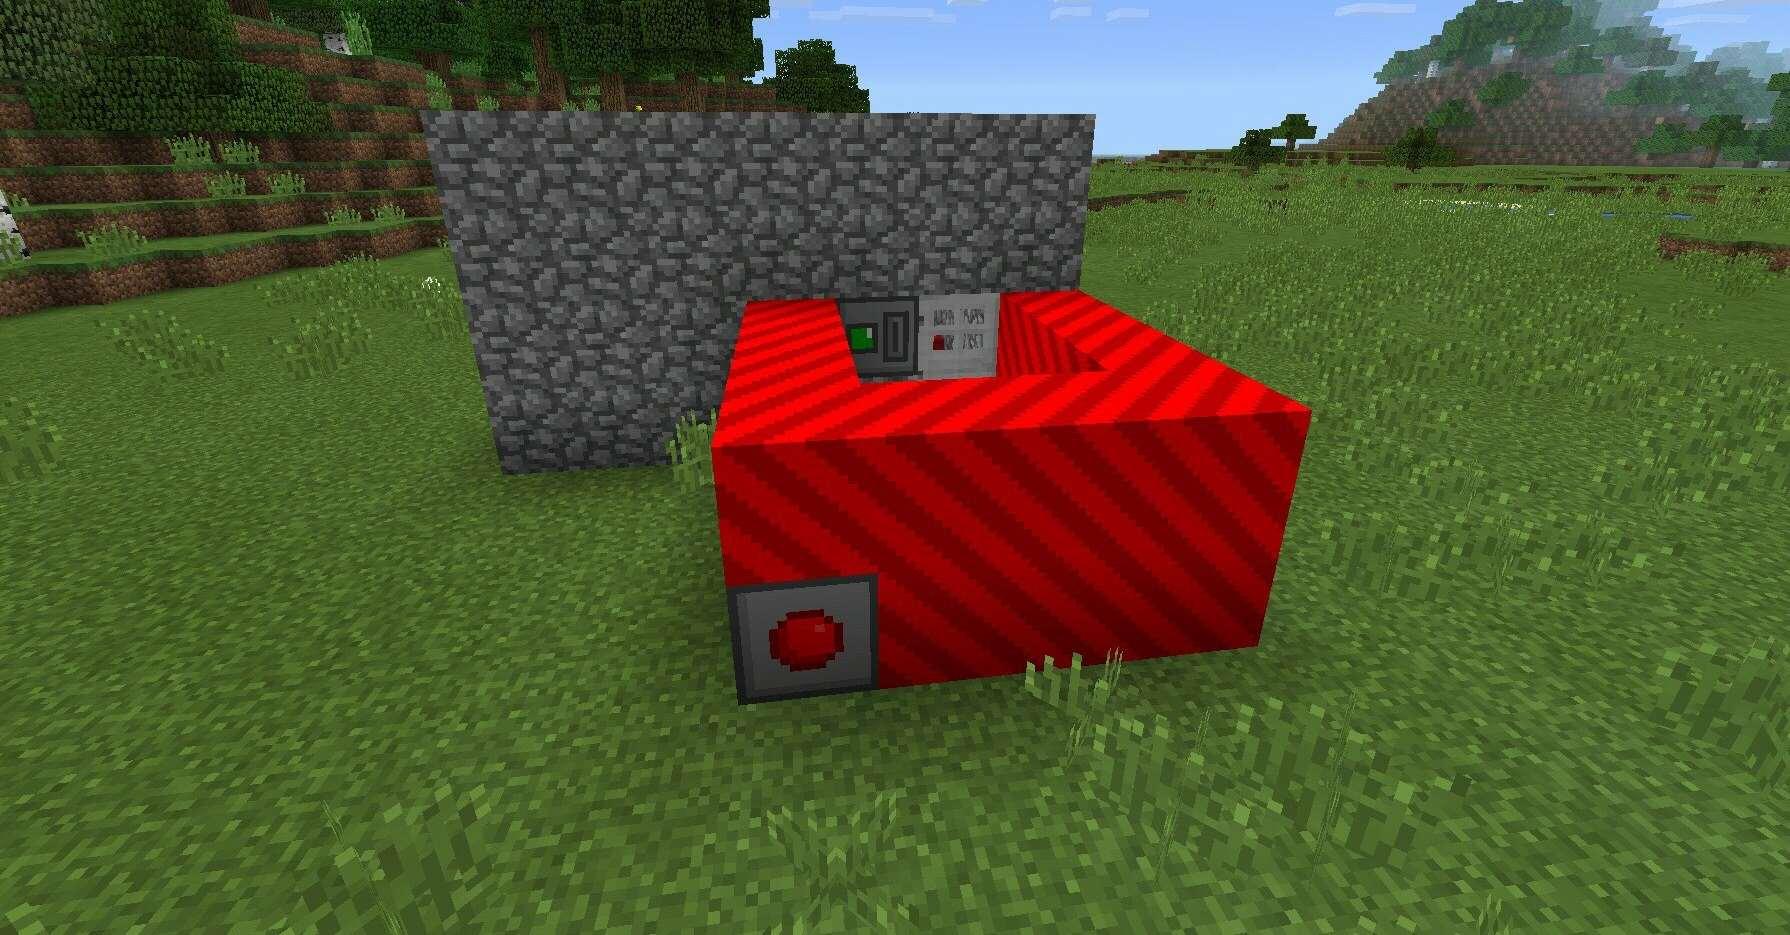 Скачать Майнкрафт 0.14.2 на Андроид | Minecraft PE